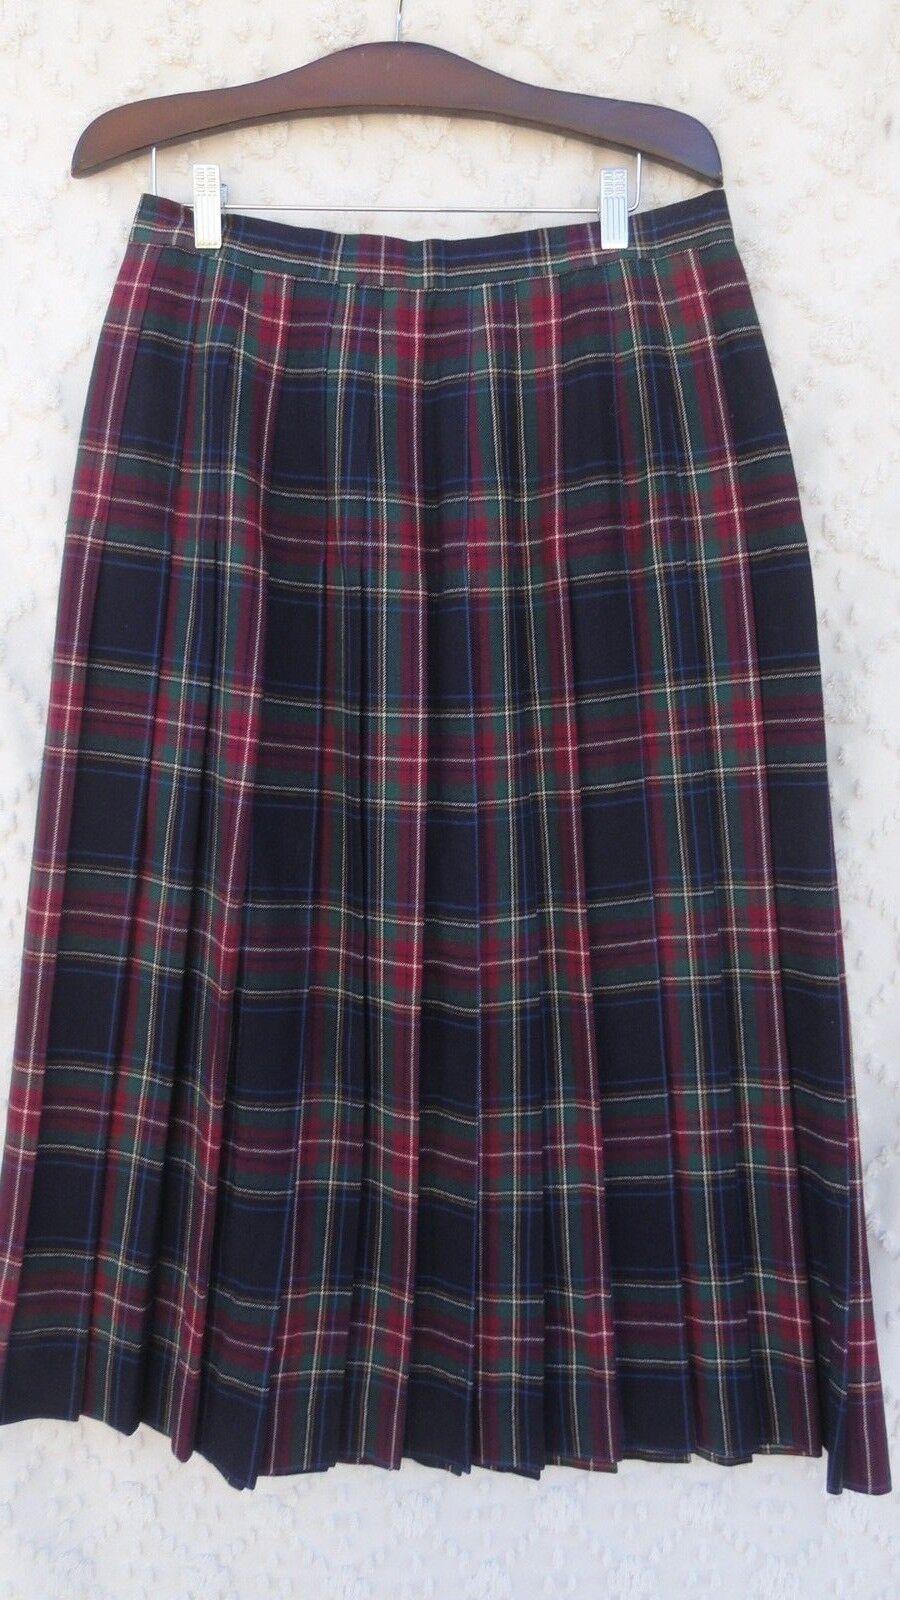 Eddie Bauer WOOL Plaid Skirt Misses 14 bluee Red Green Tartan Plaid USA Made